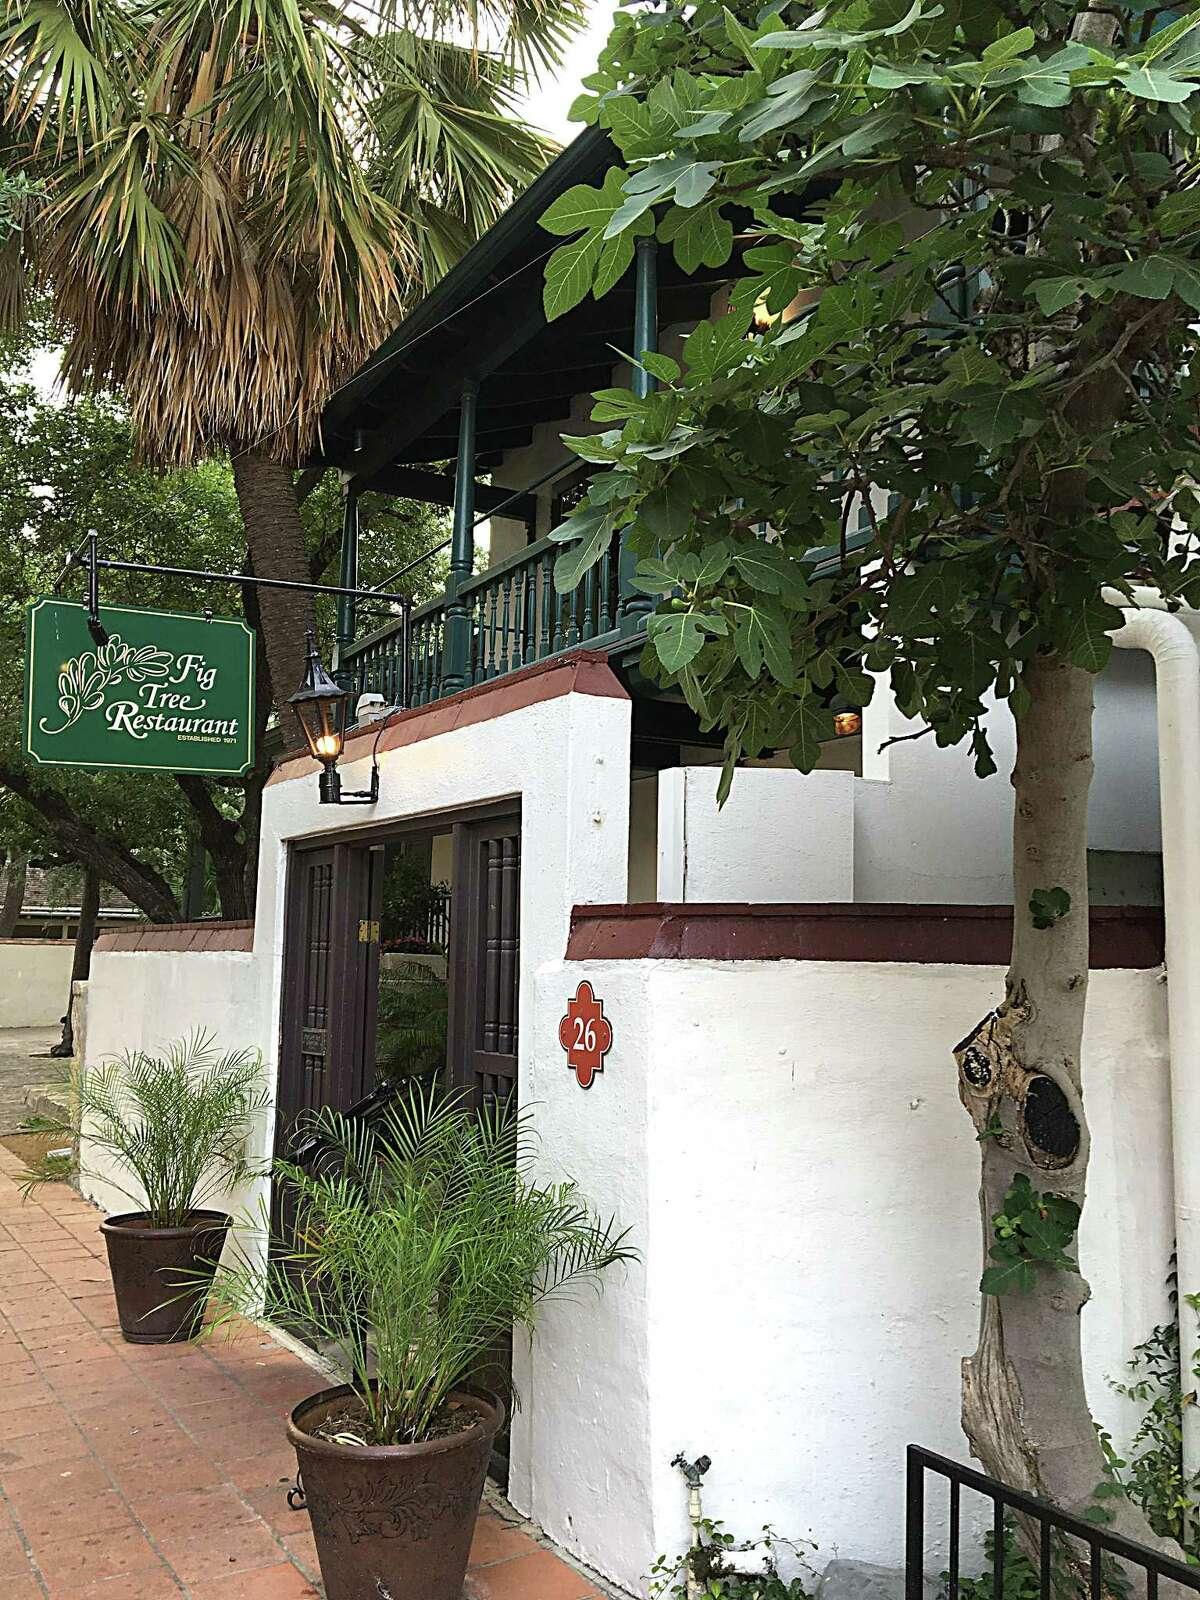 Fig Tree Restaurant 515 Villita St.  Featured in Express-News' list of Top 100 restaurants and bars